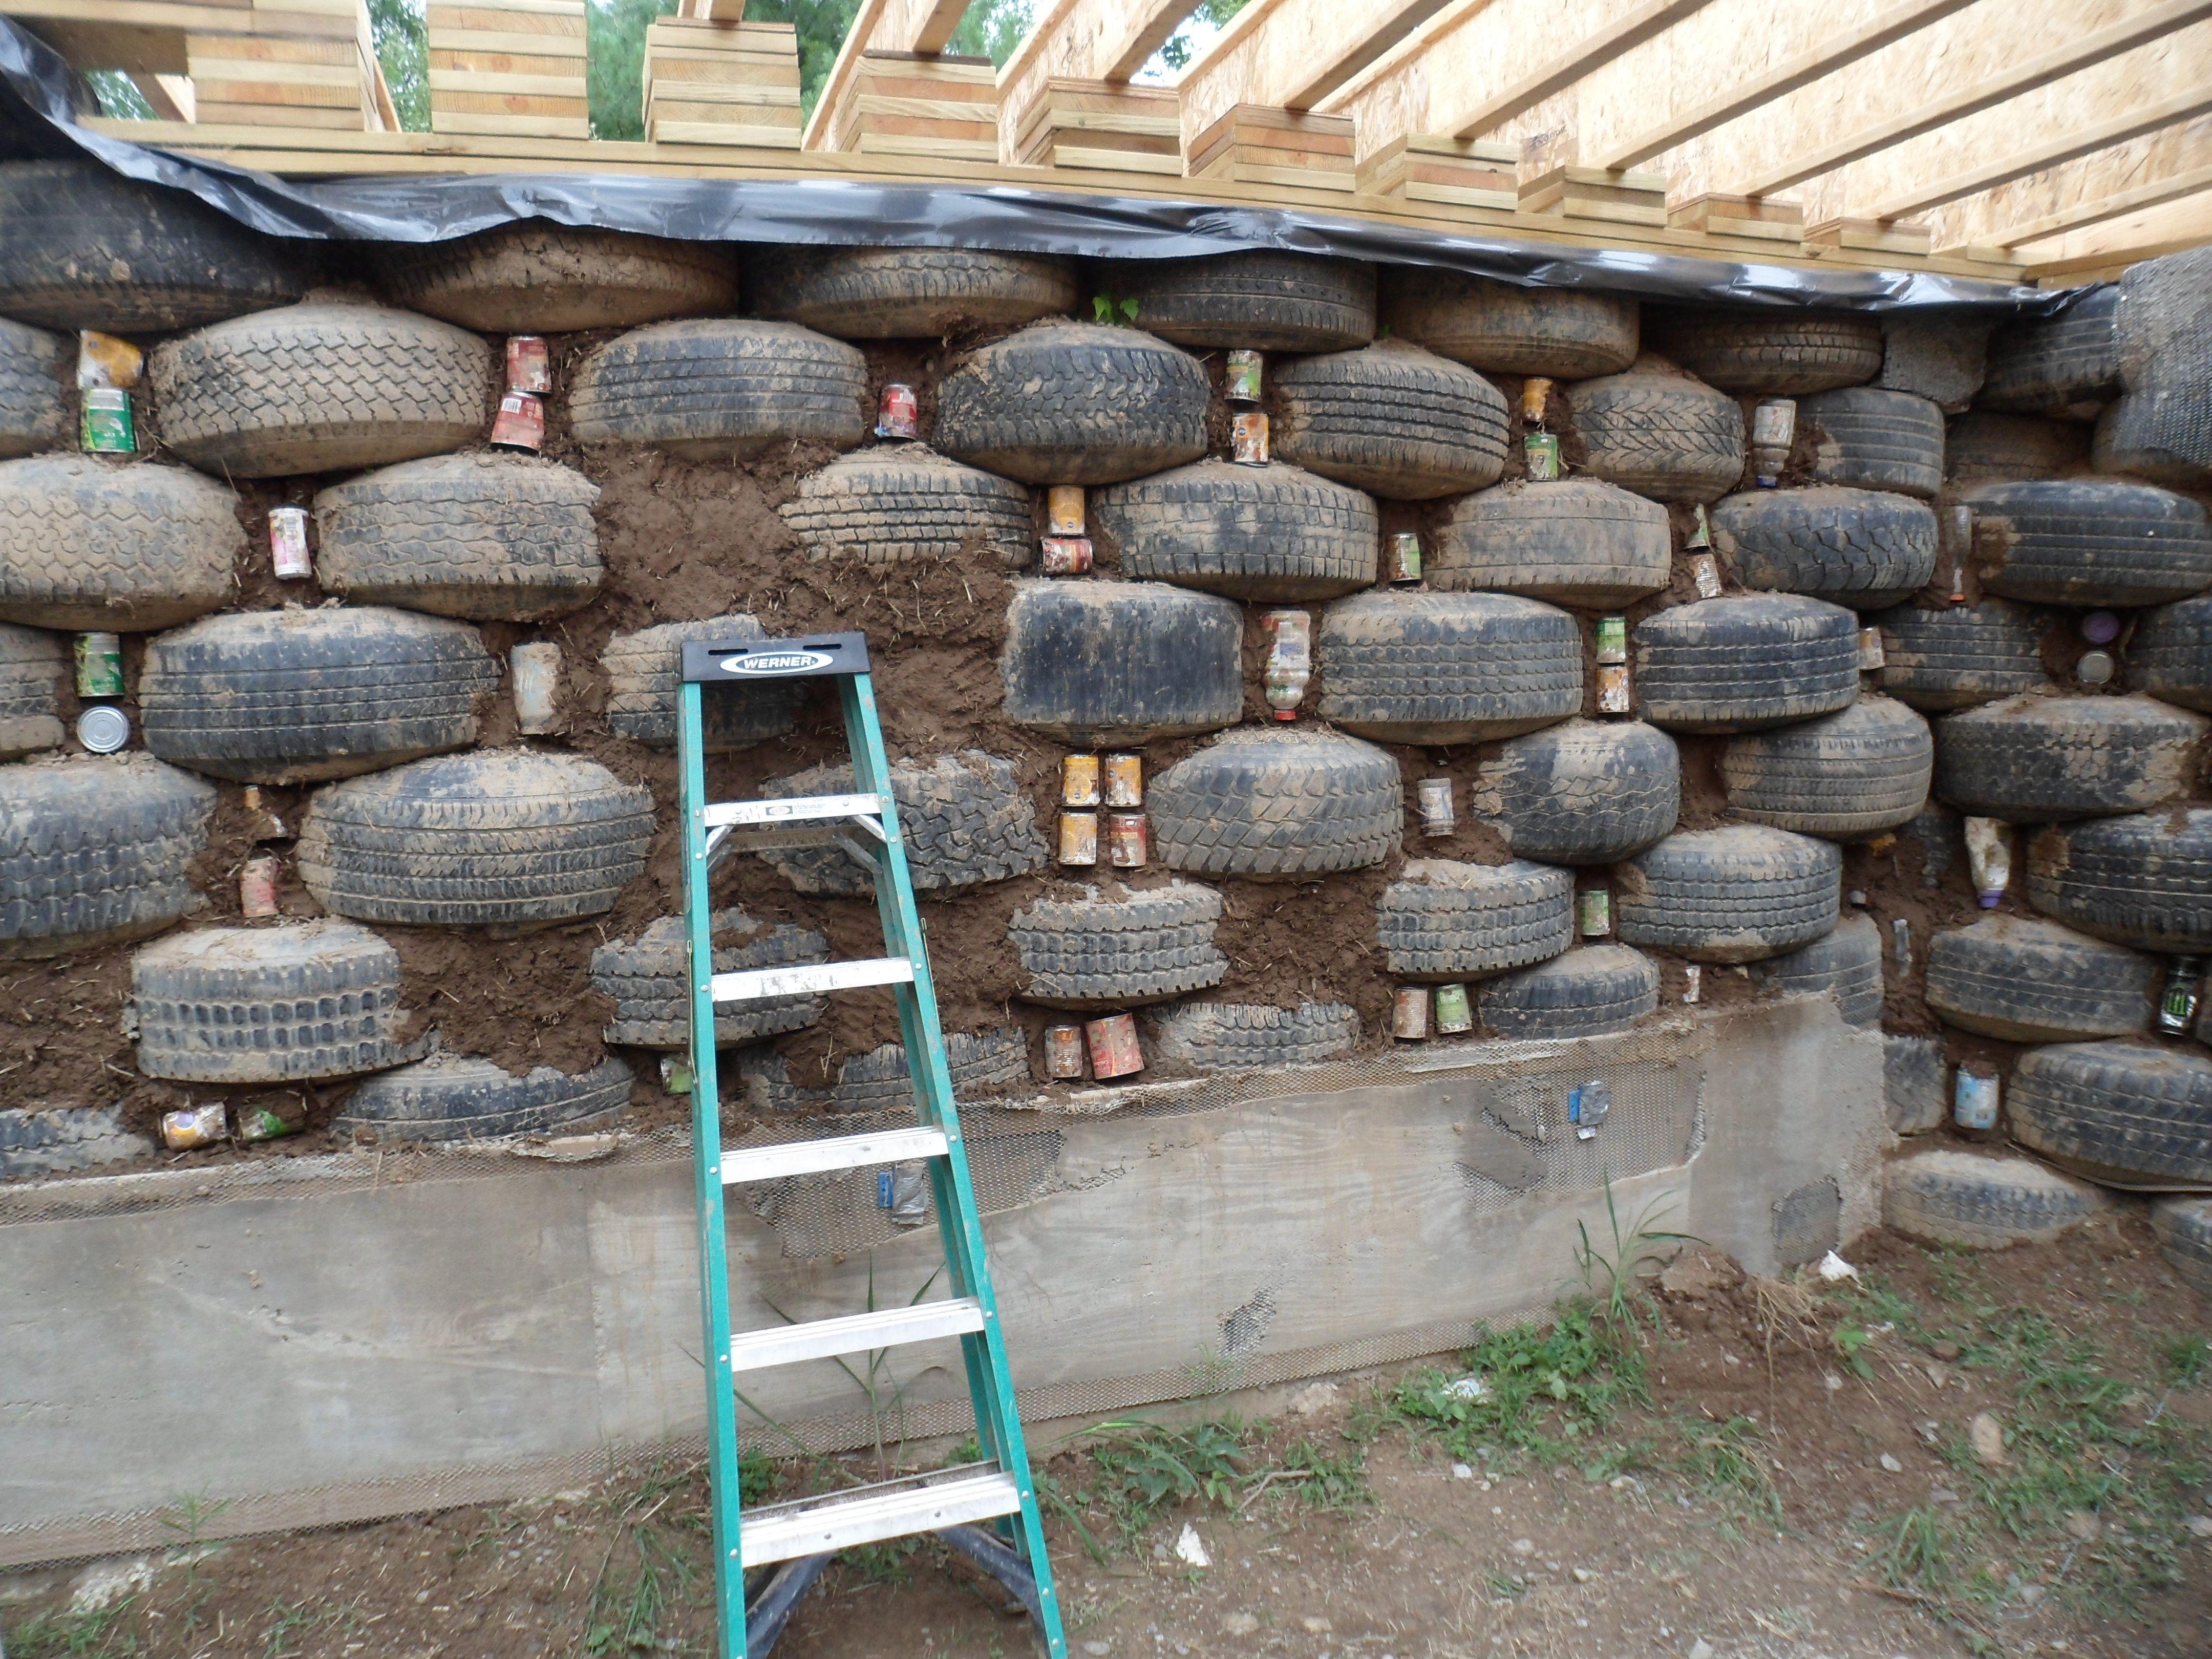 Rammed Earth Home Design Cronk Earthship Tire House